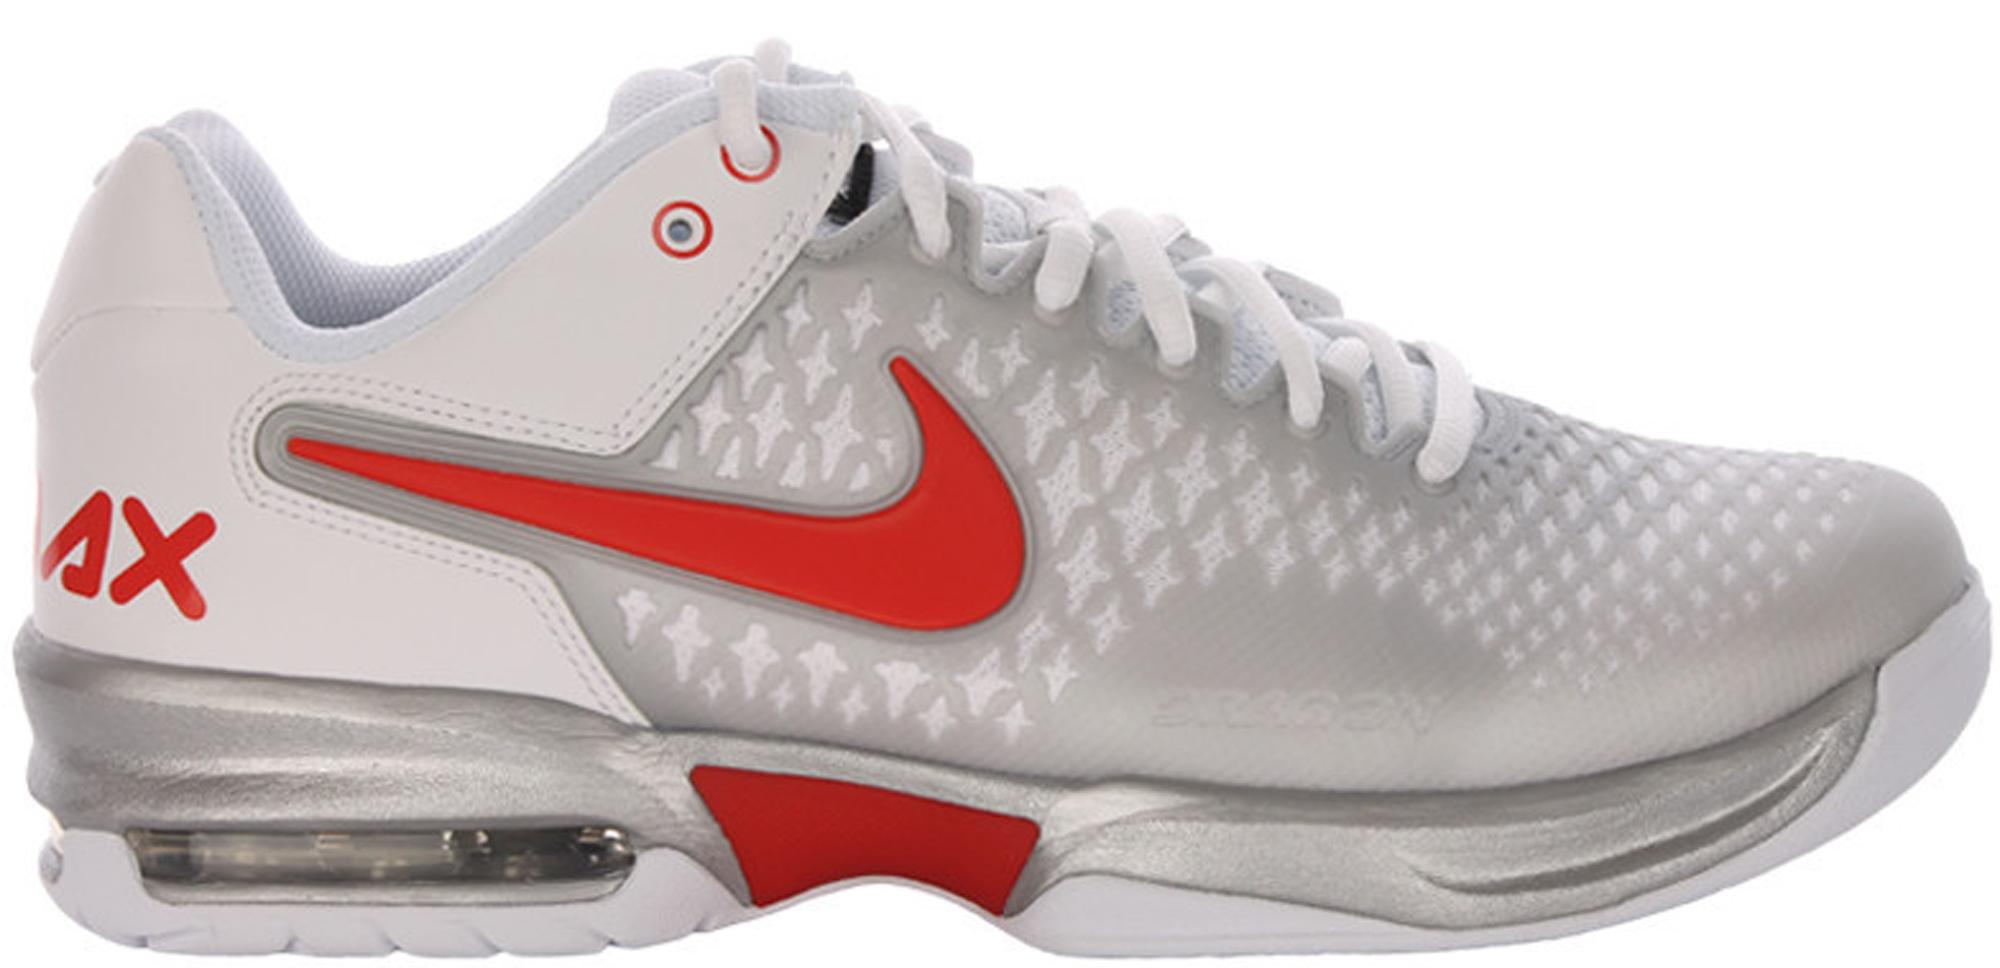 Nike Air Max Cage Silver Crimson